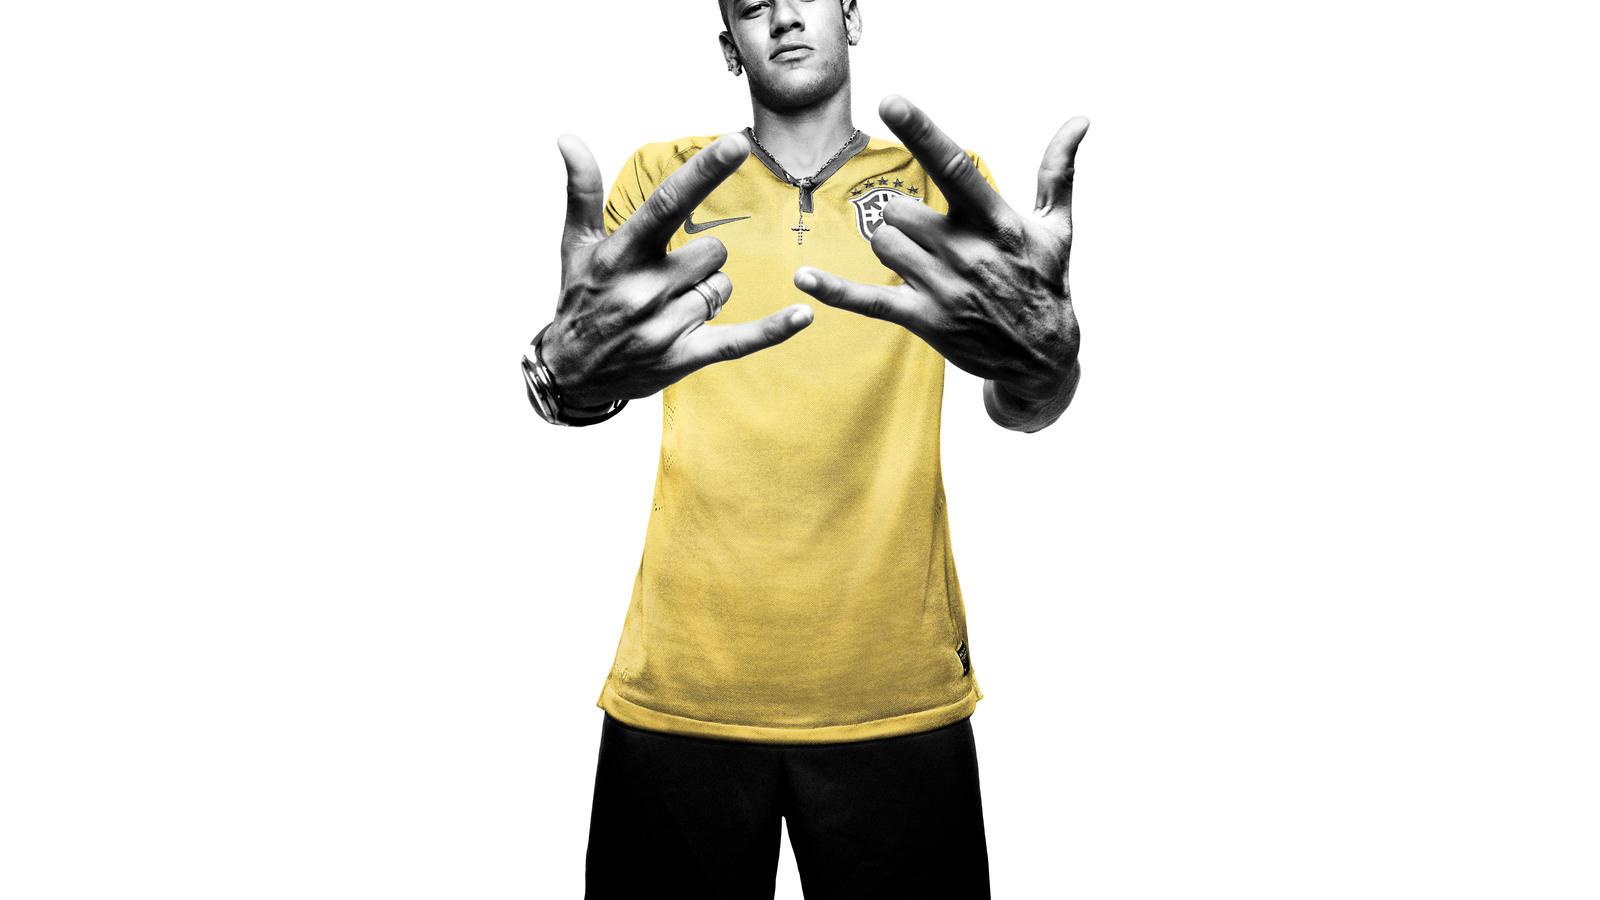 Neymar Platon Image